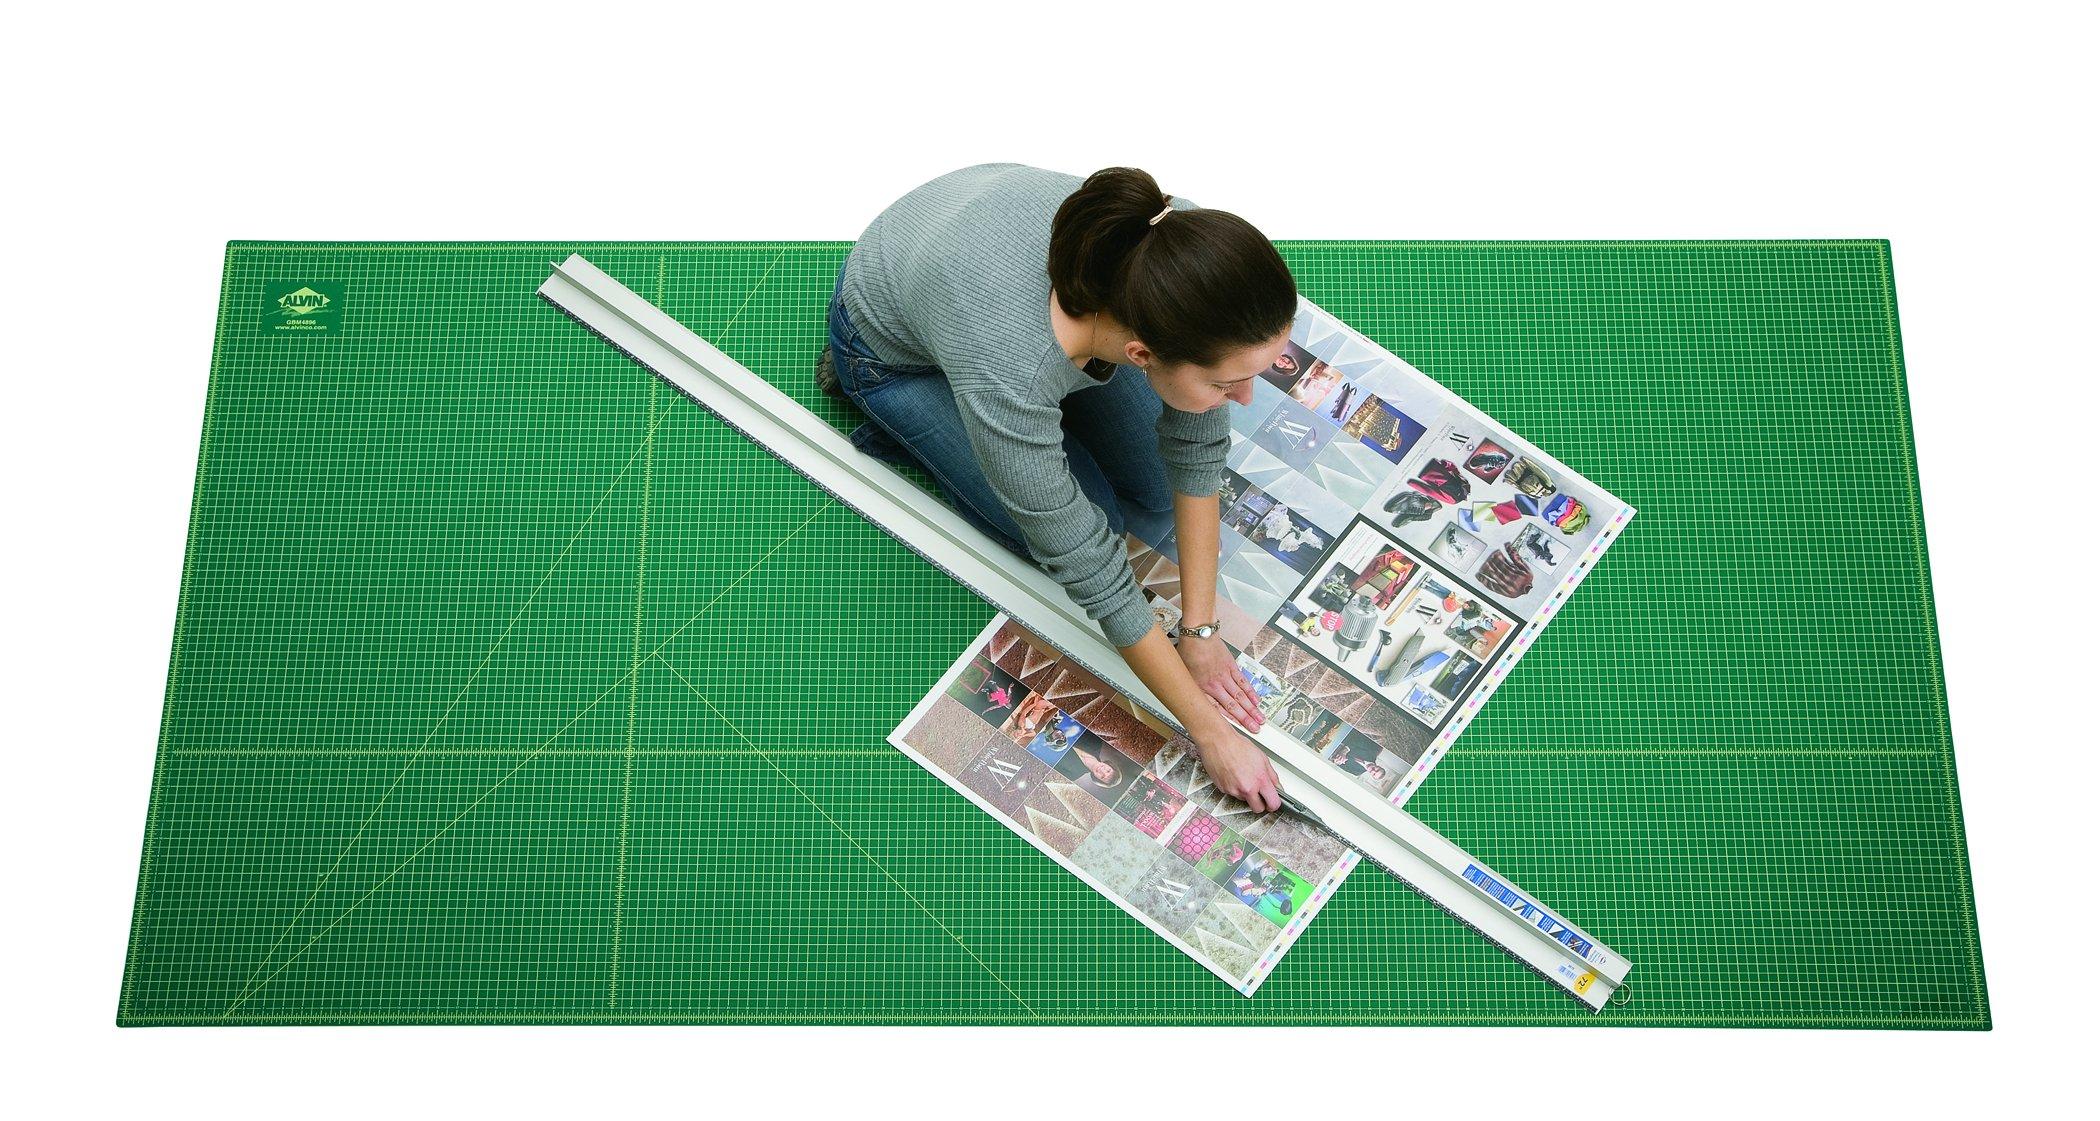 Alvin GBM Series Green/Black Professional Self-Healing Cutting Mat 36 x 48 (GBM3648) by Alvin (Image #4)